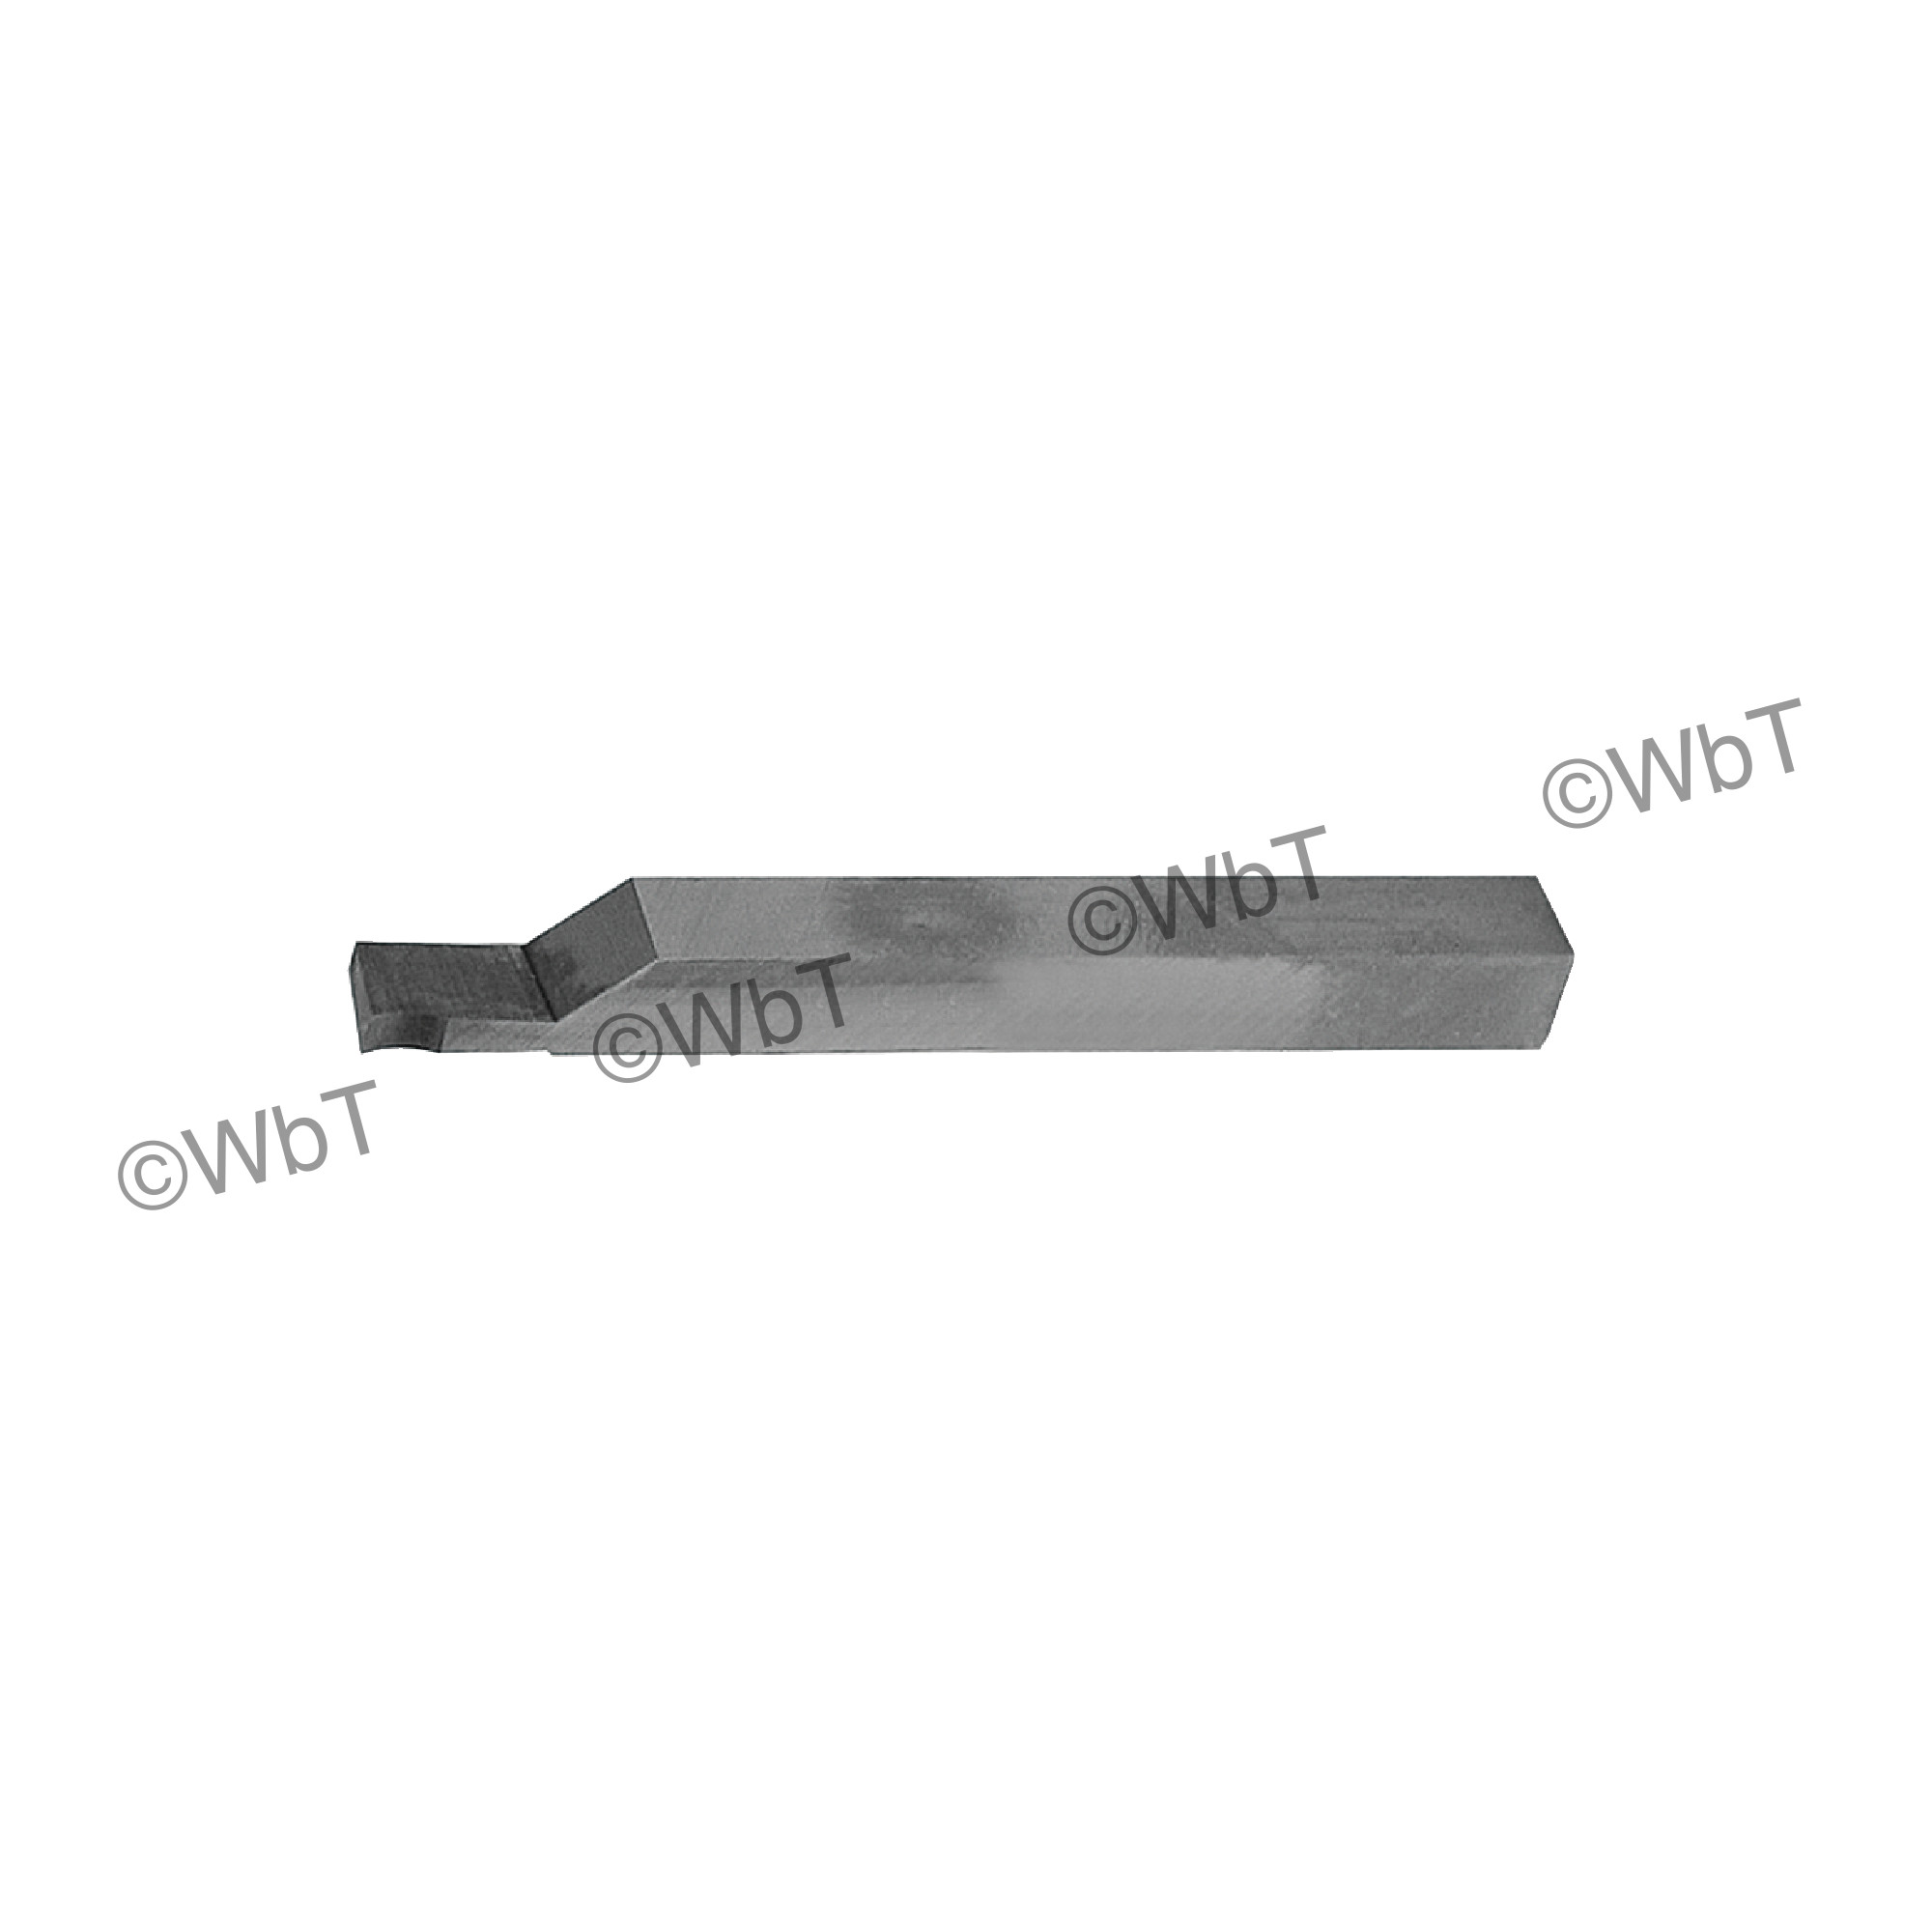 "1/2"" Cut-Off Tool High Speed Steel Lathe Tool"